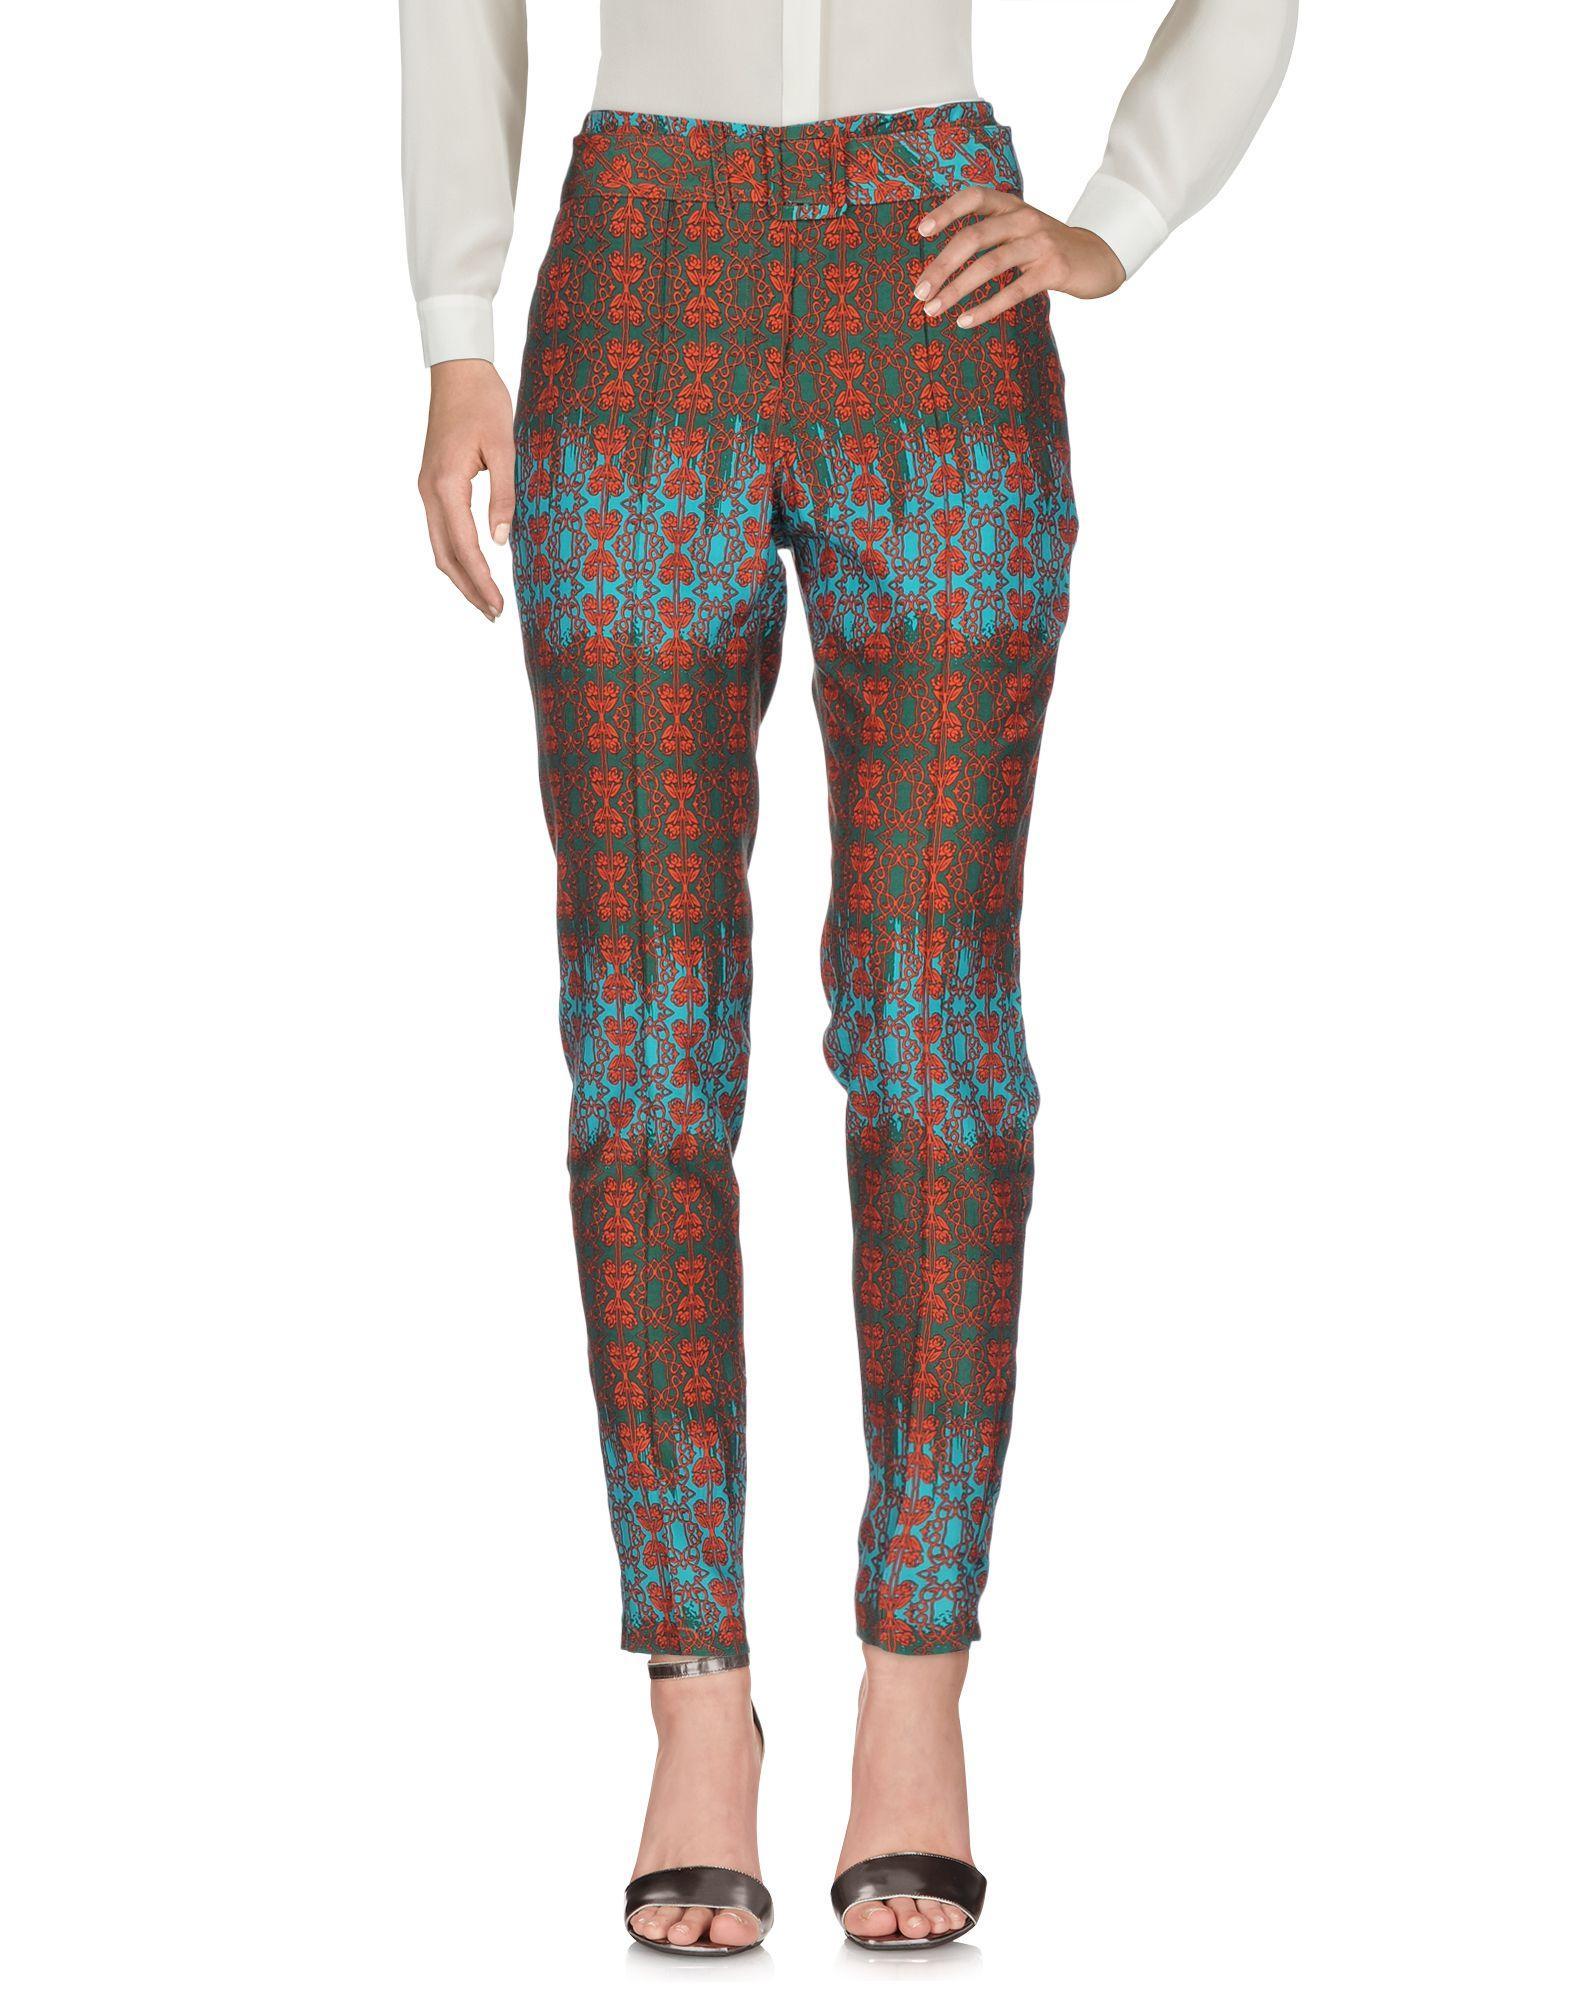 SOPHIE THEALLET Casual pants,13157317LI 4